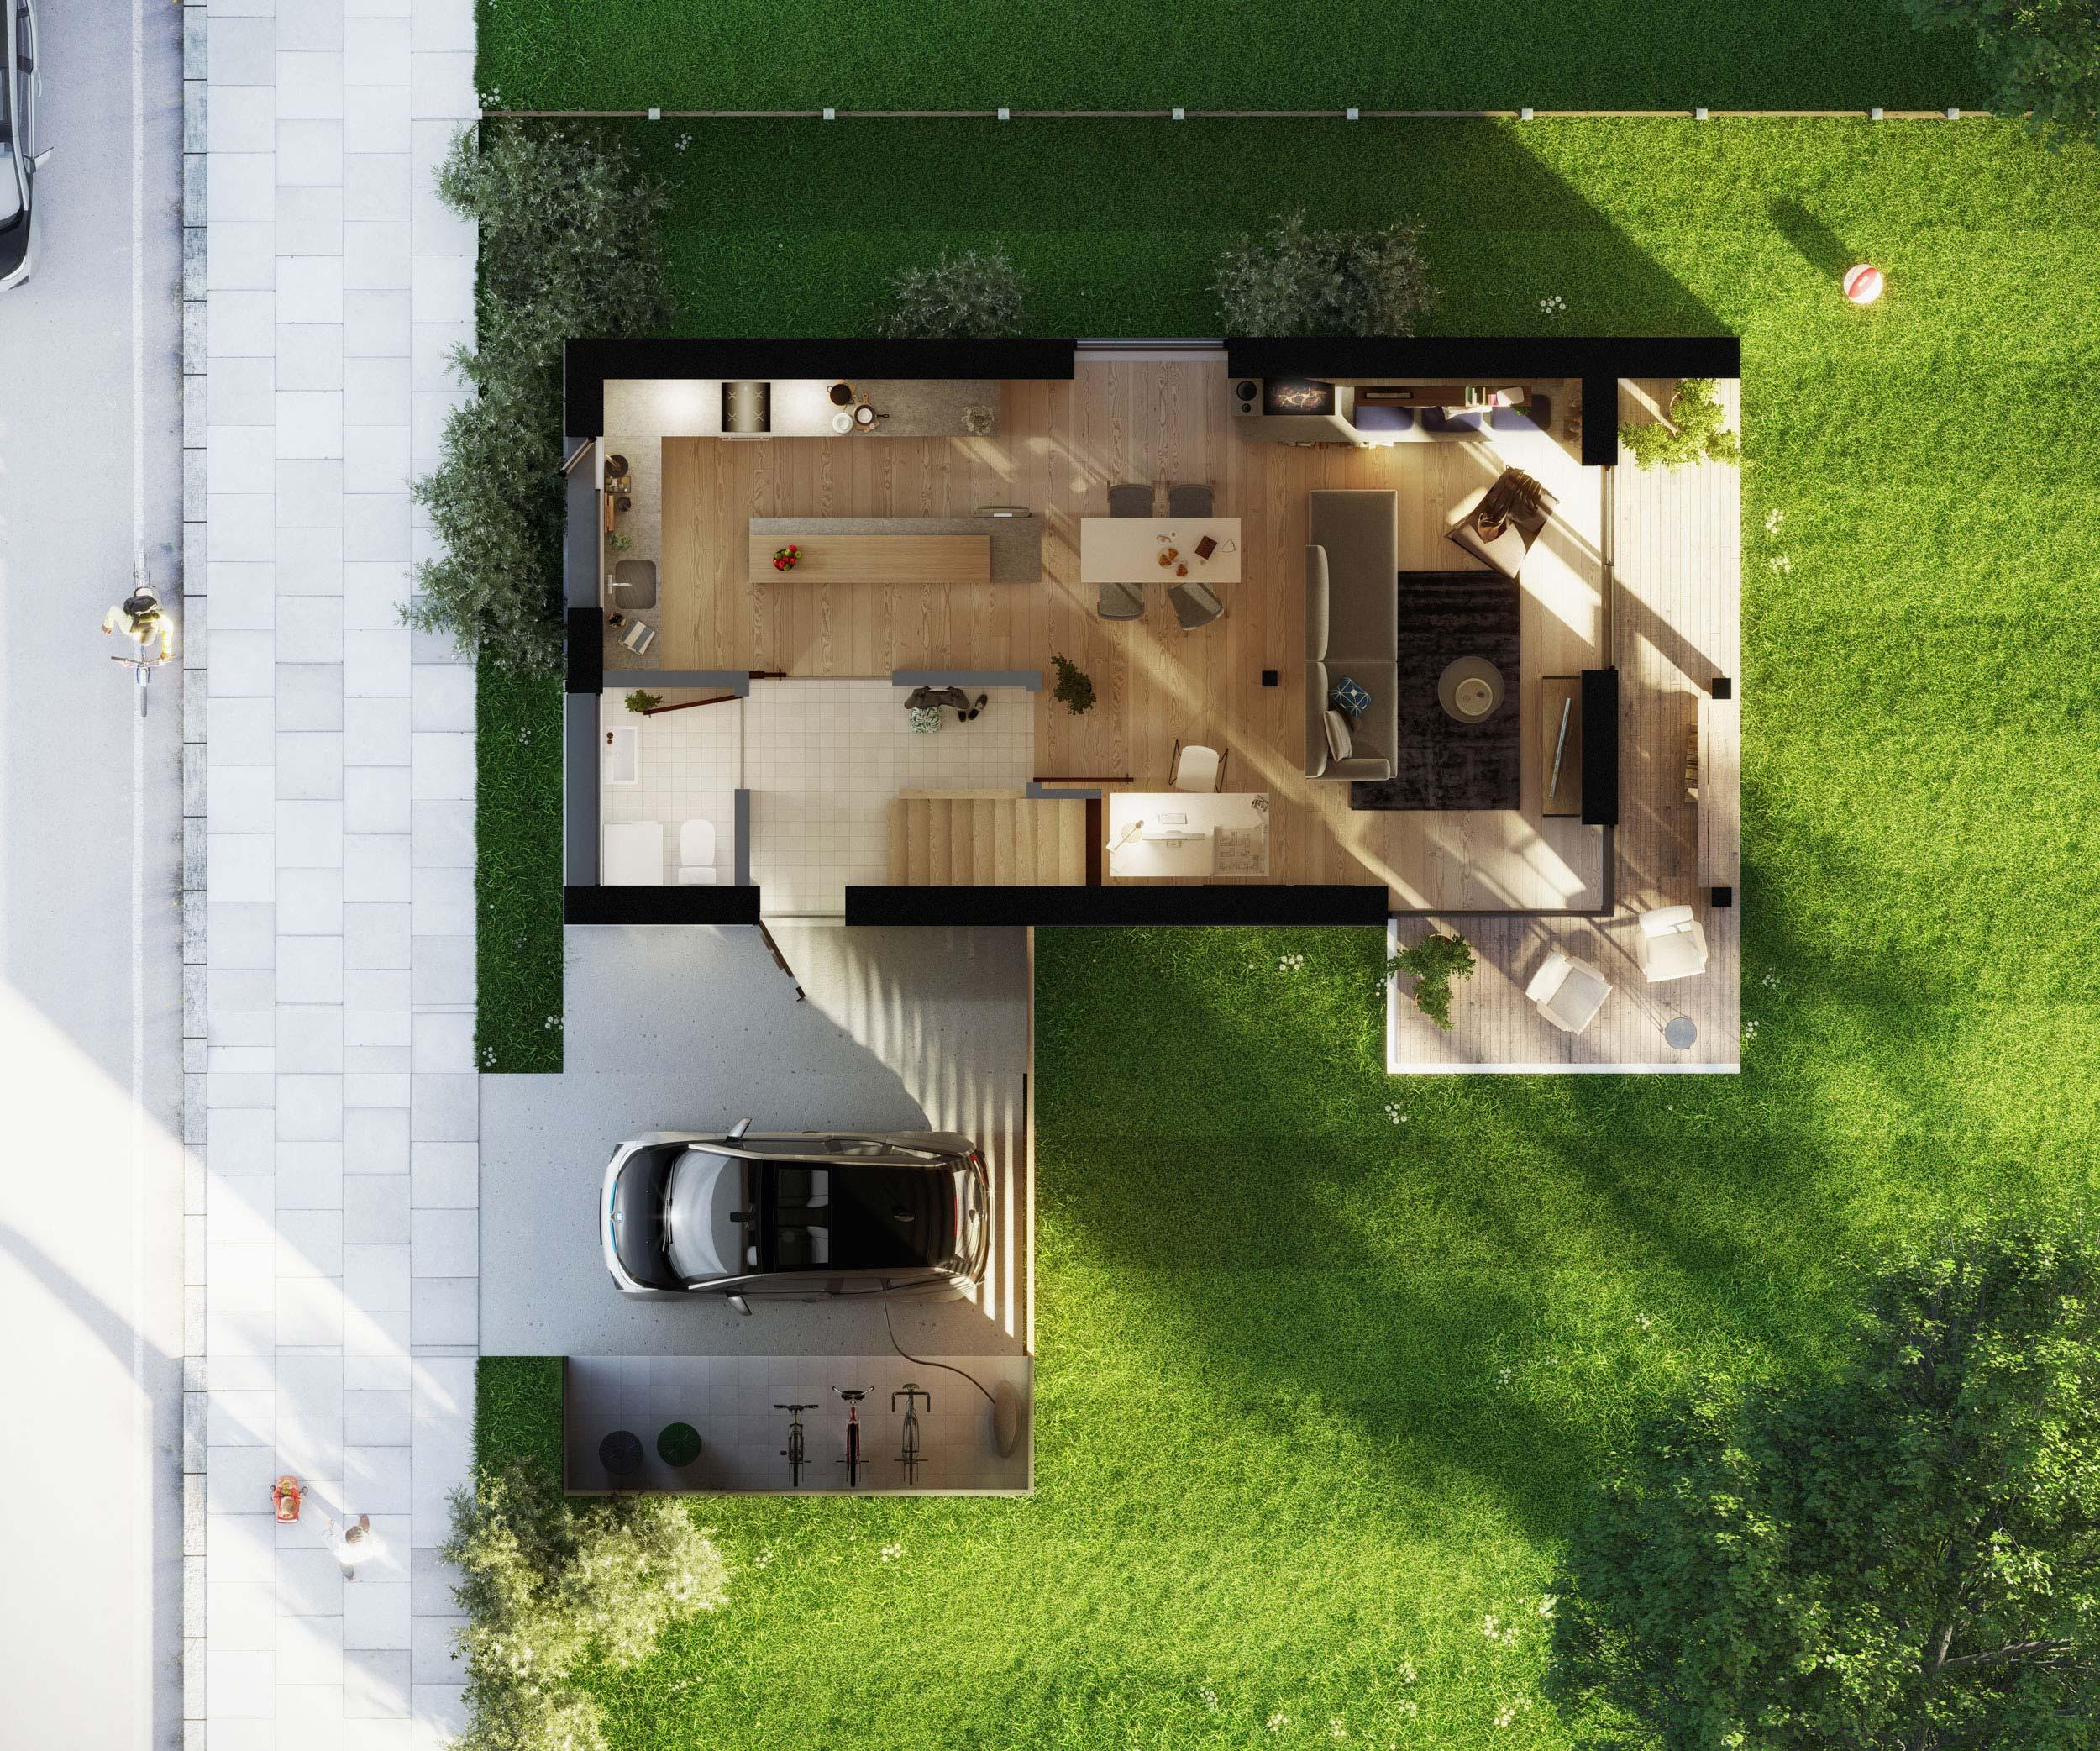 Alex-Kaiser-Different-Ground-Floor-plan-visualisaiton-CGI-London-01.jpg